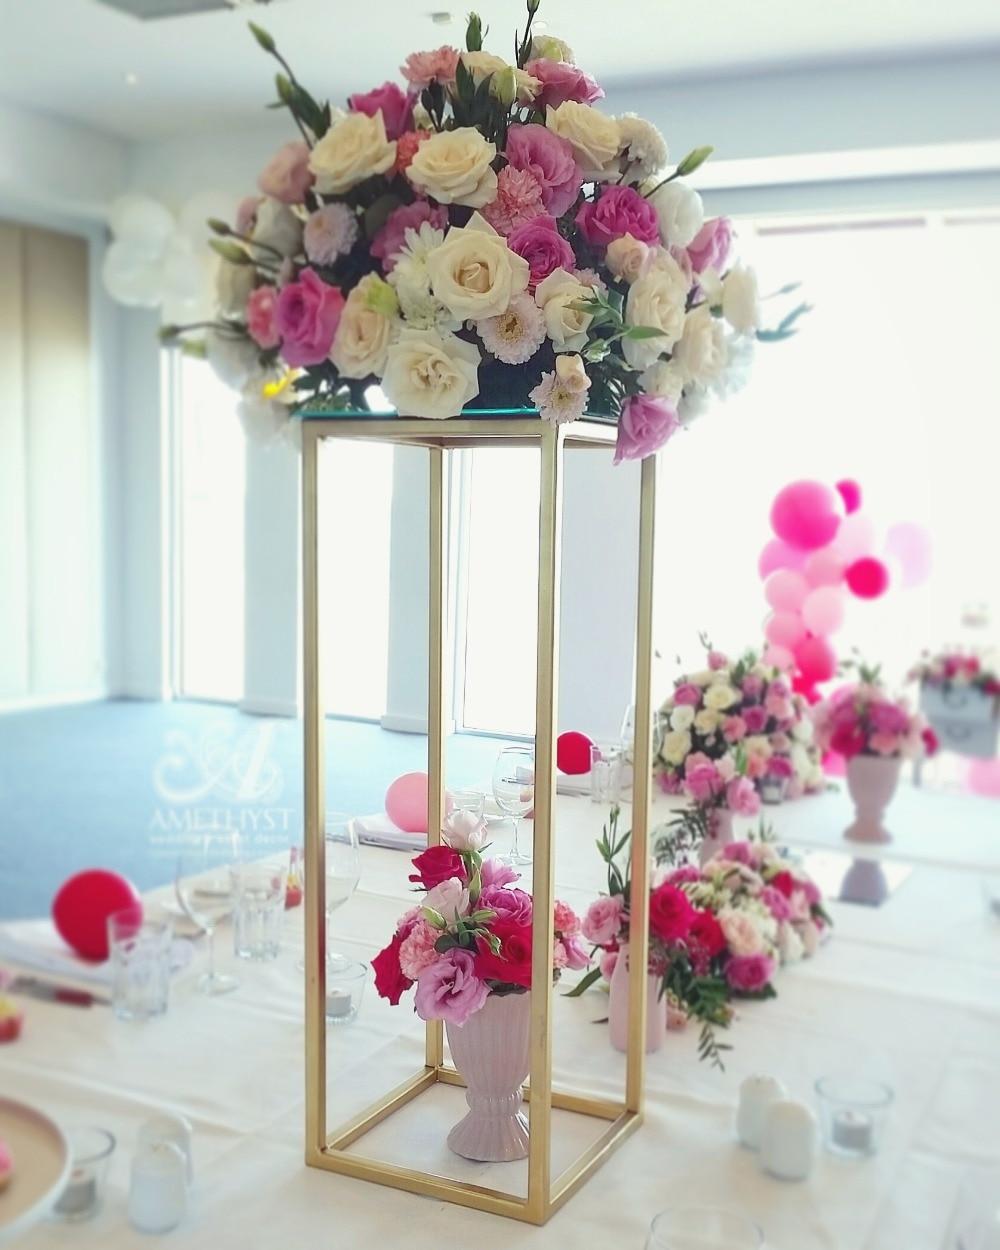 80cm Tall Wedding Flower Vase Metal Trumpet Vase For: 80cm Tall Flower Vase Gold Column Stand Metal Road Lead